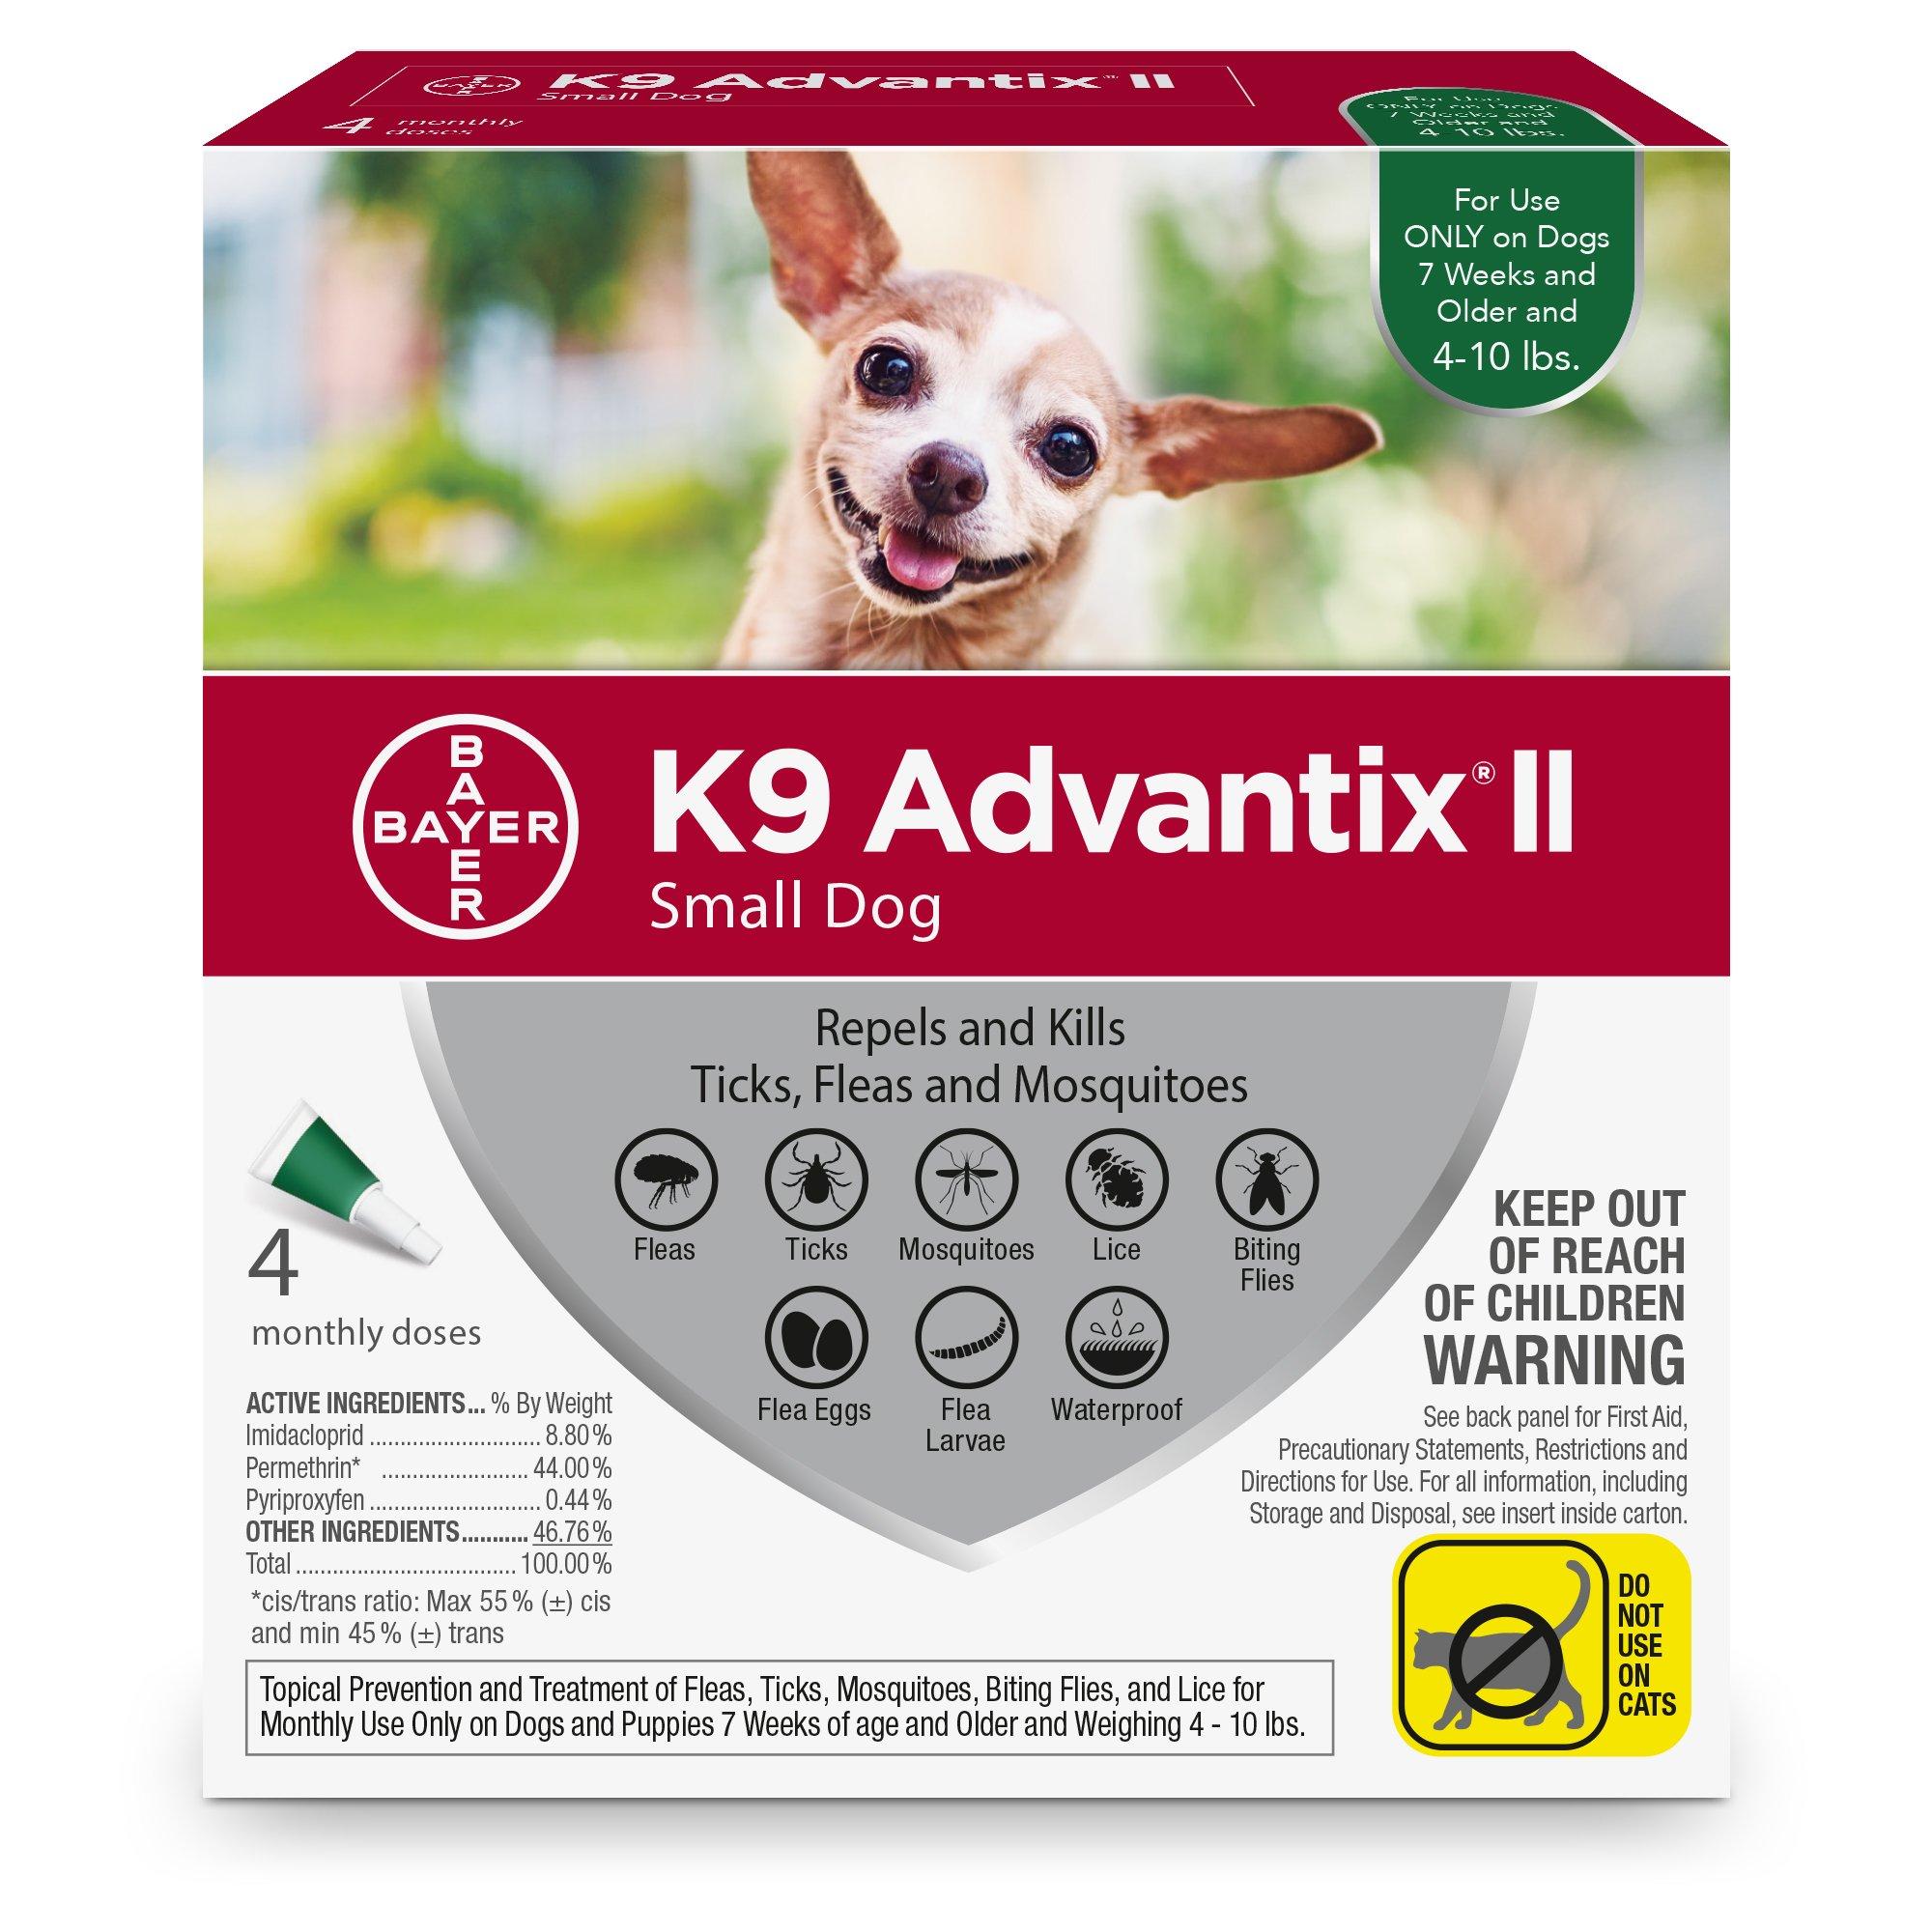 Bayer K9 Advantix II Flea, Tick and Mosquito Prevention for Small Dogs, 4 - 10 lb, 4 doses